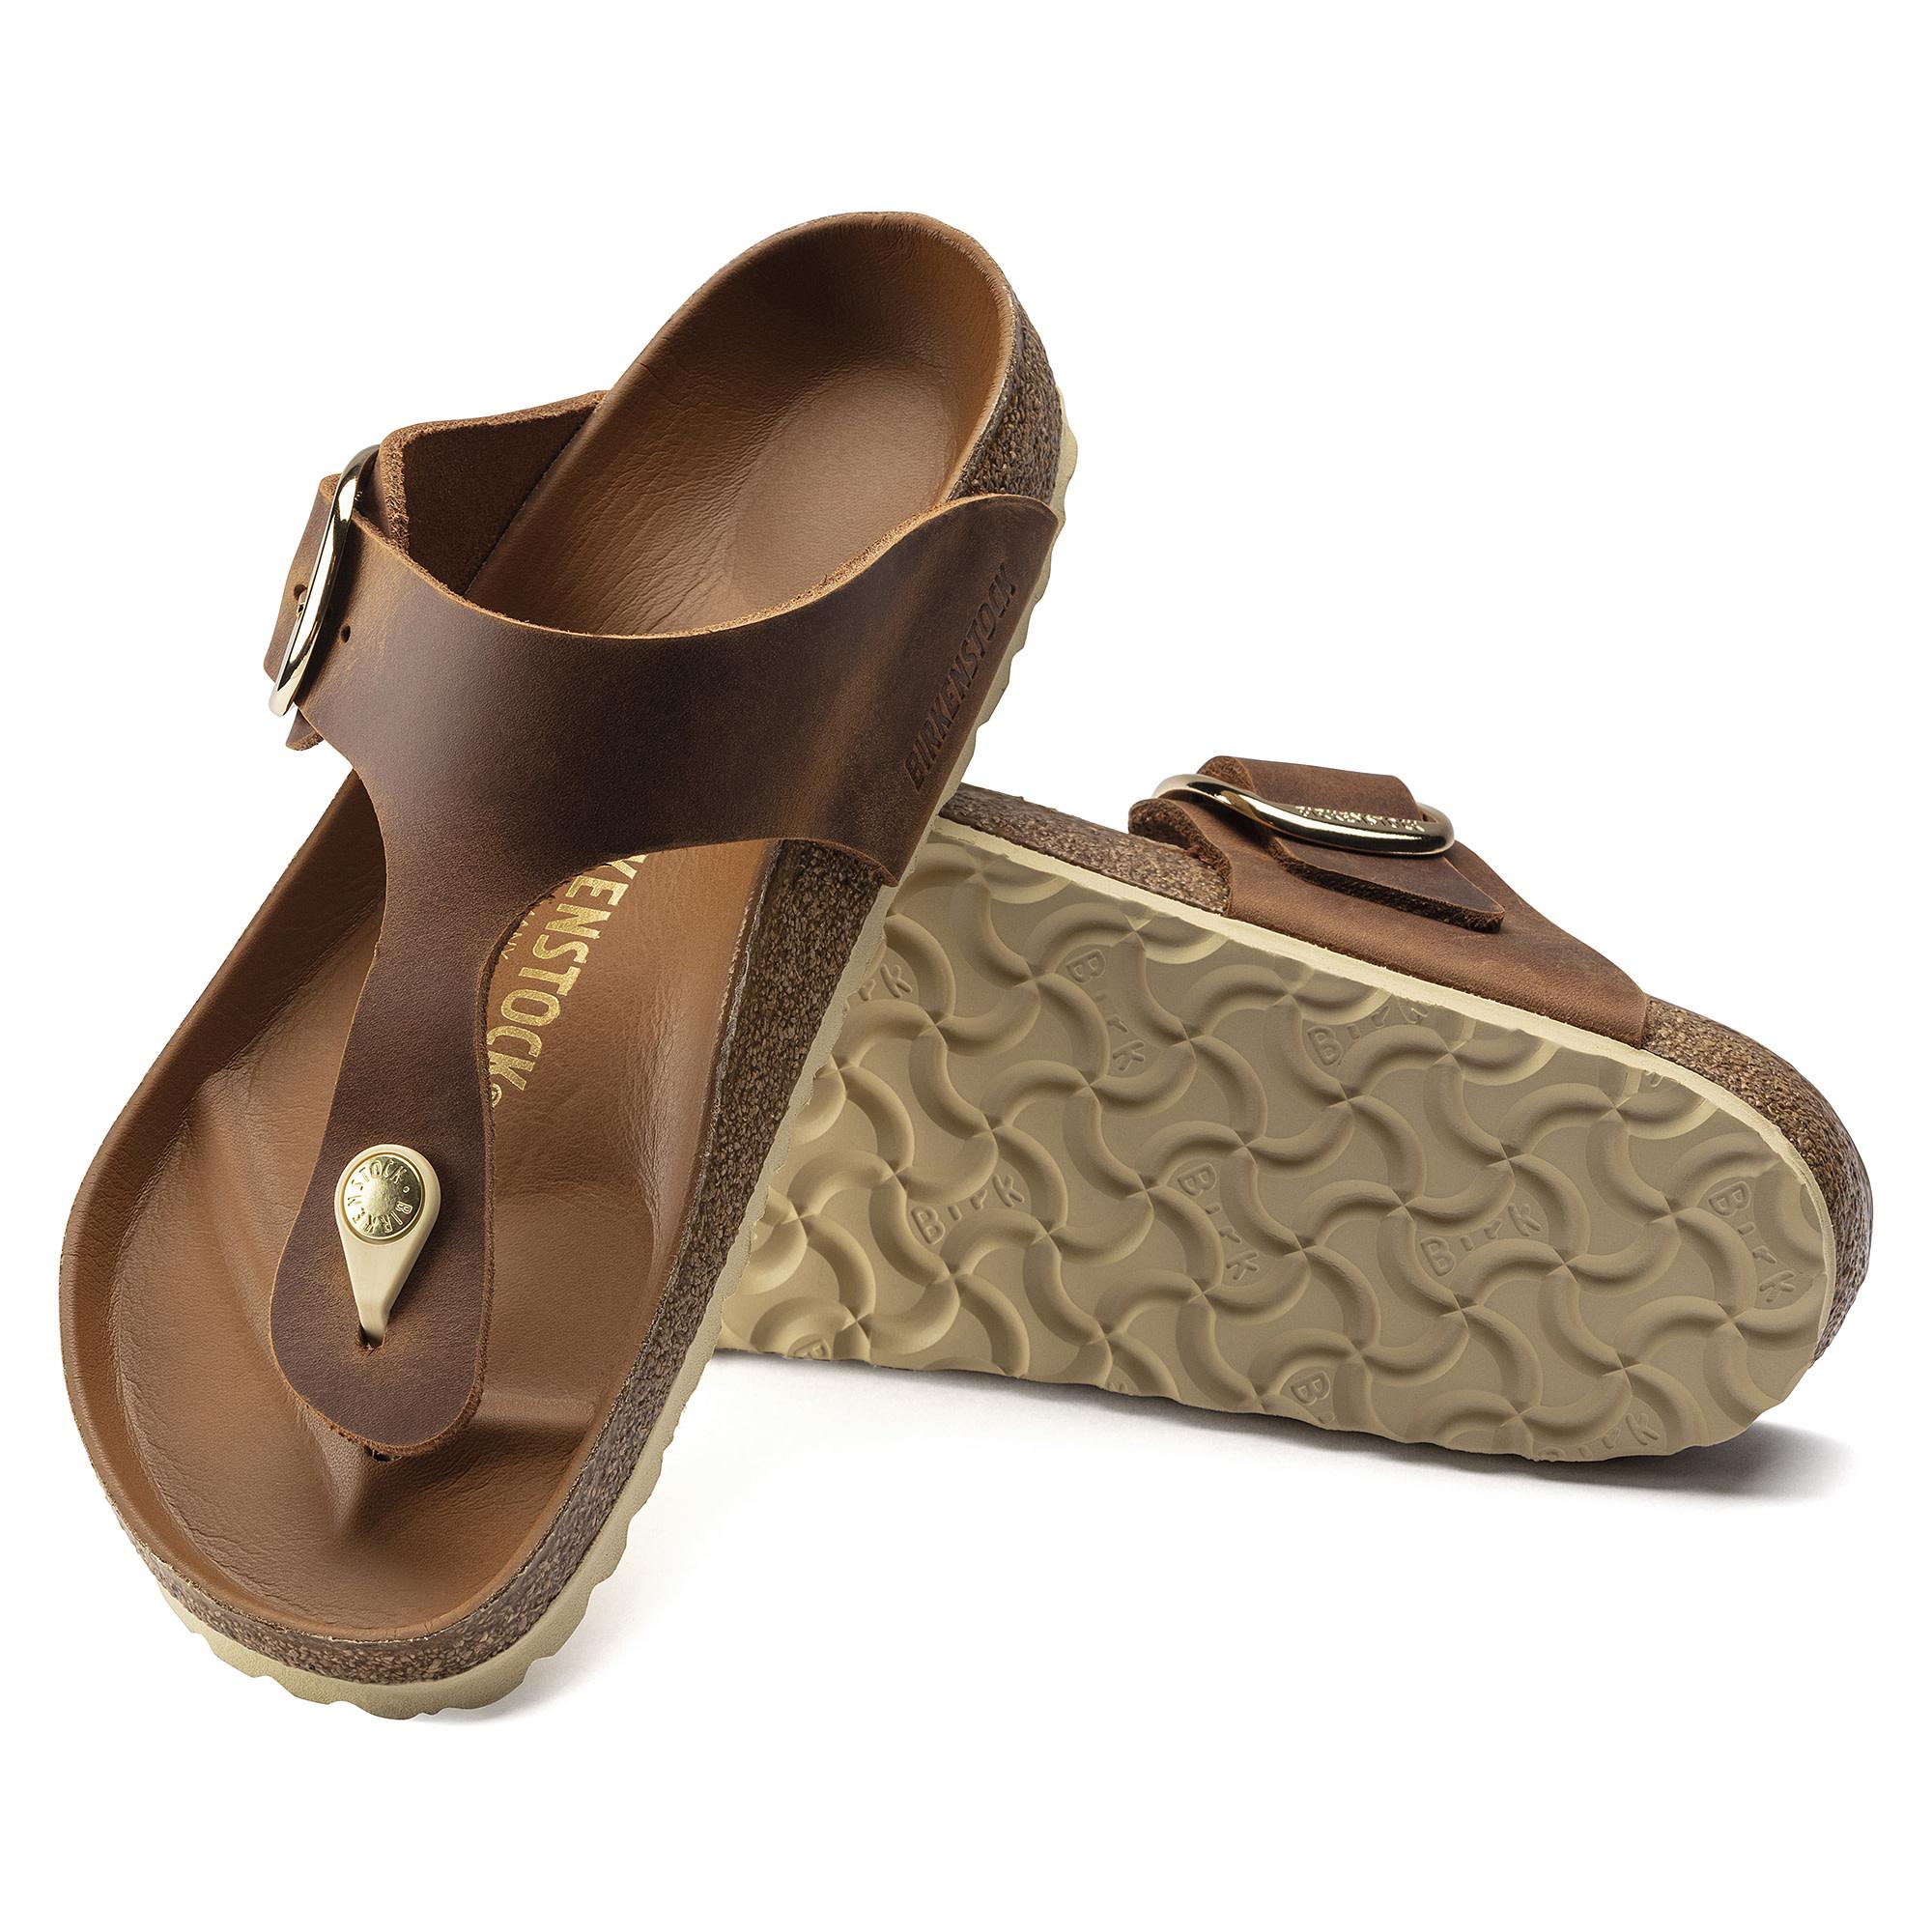 Birkenstock Birkenstock Gizeh Big Buckle Leather (Femmes - Régulier) - Cognac